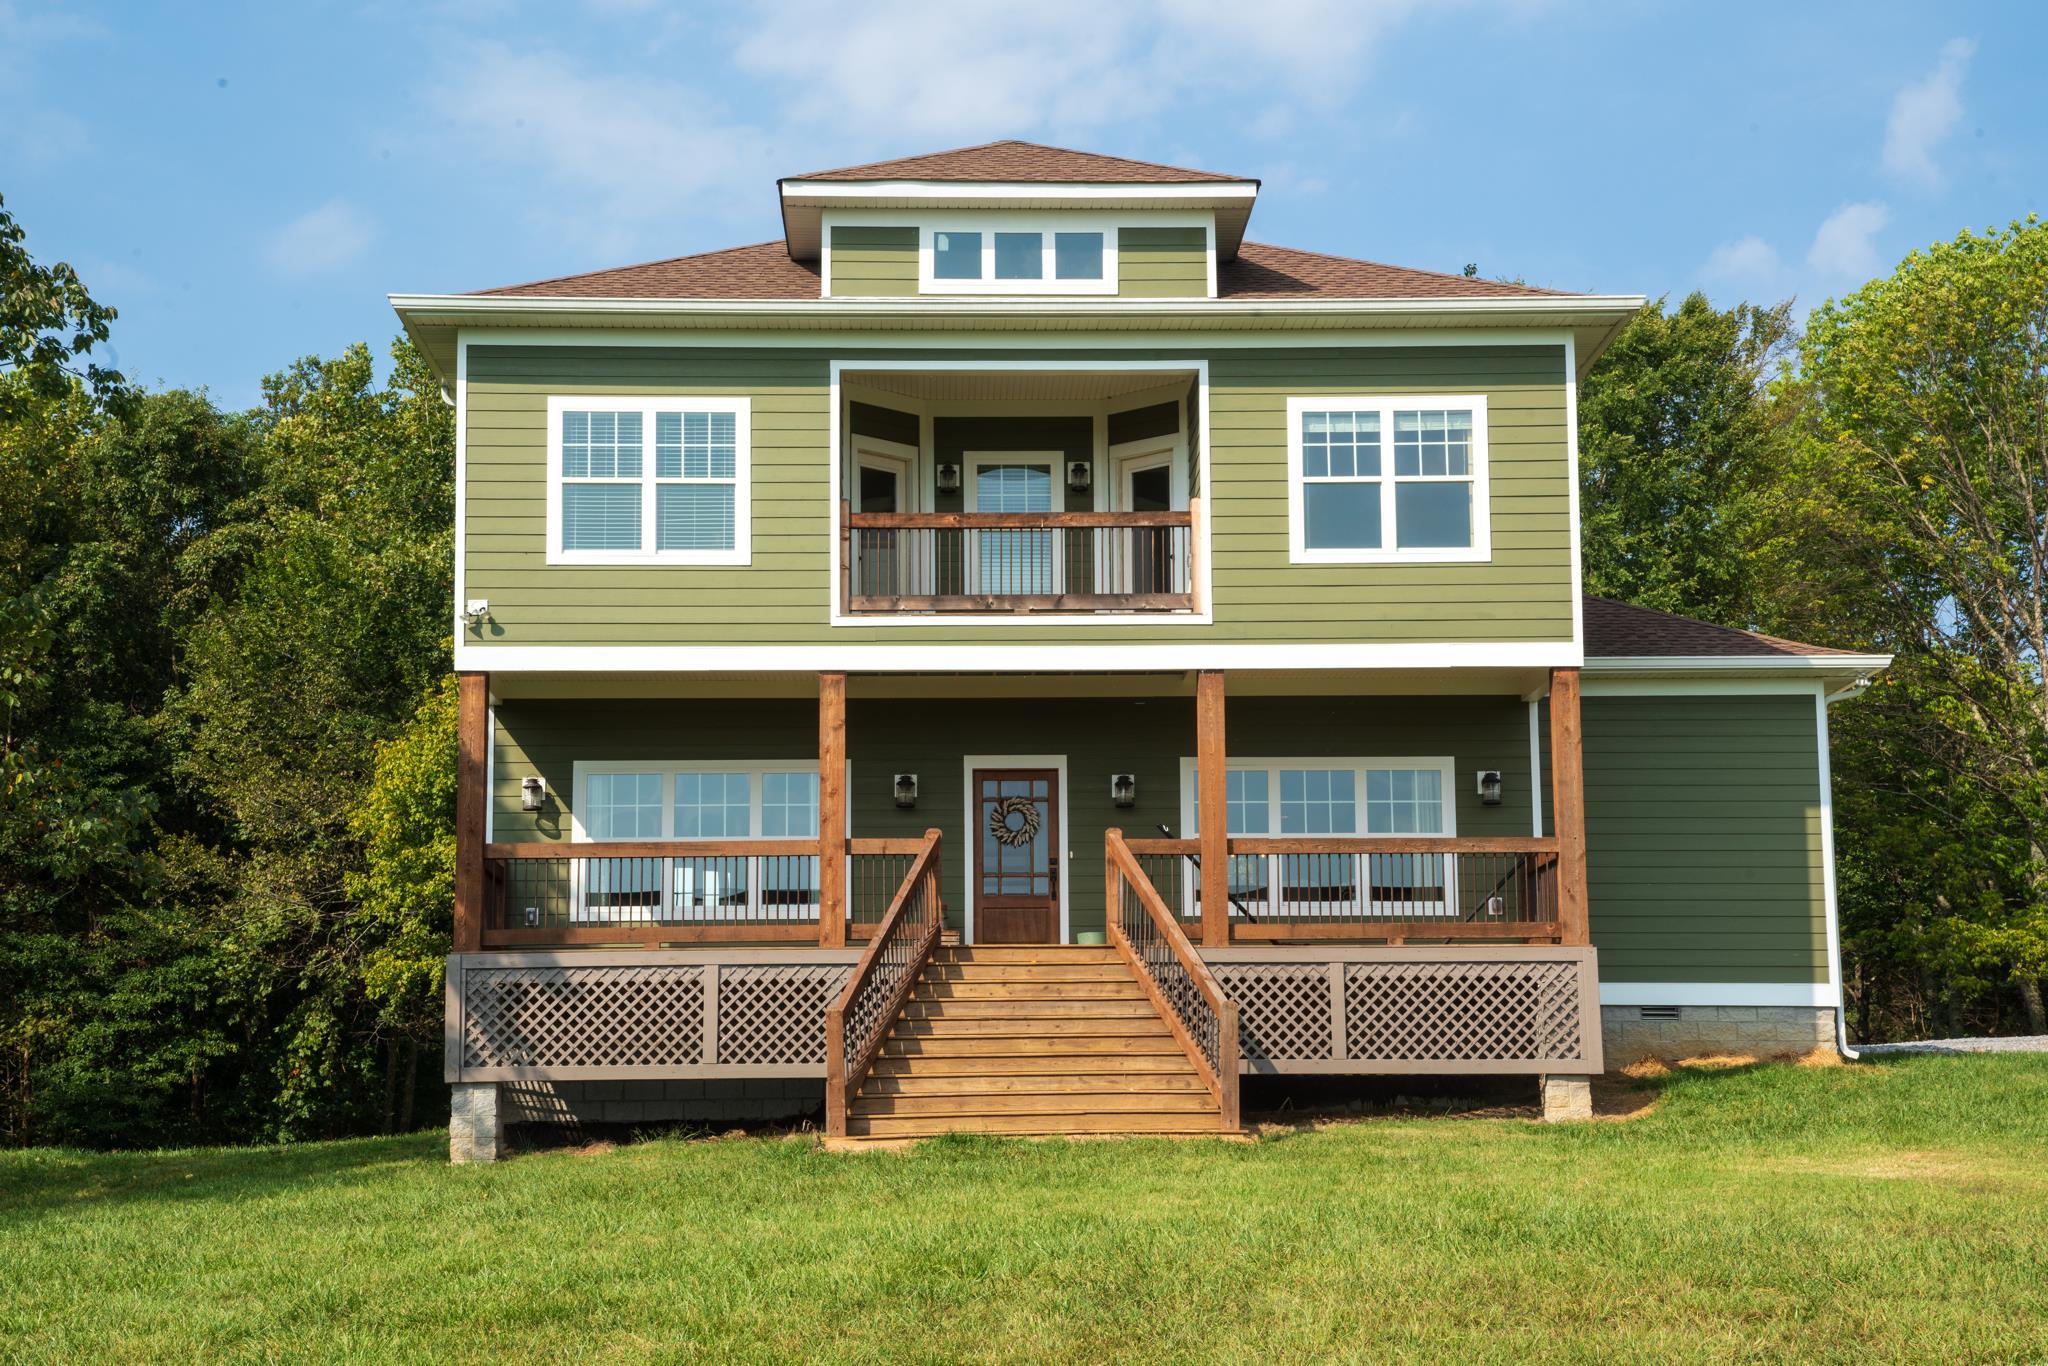 337 Vantrease Ln, Gallatin, TN 37066 - Gallatin, TN real estate listing